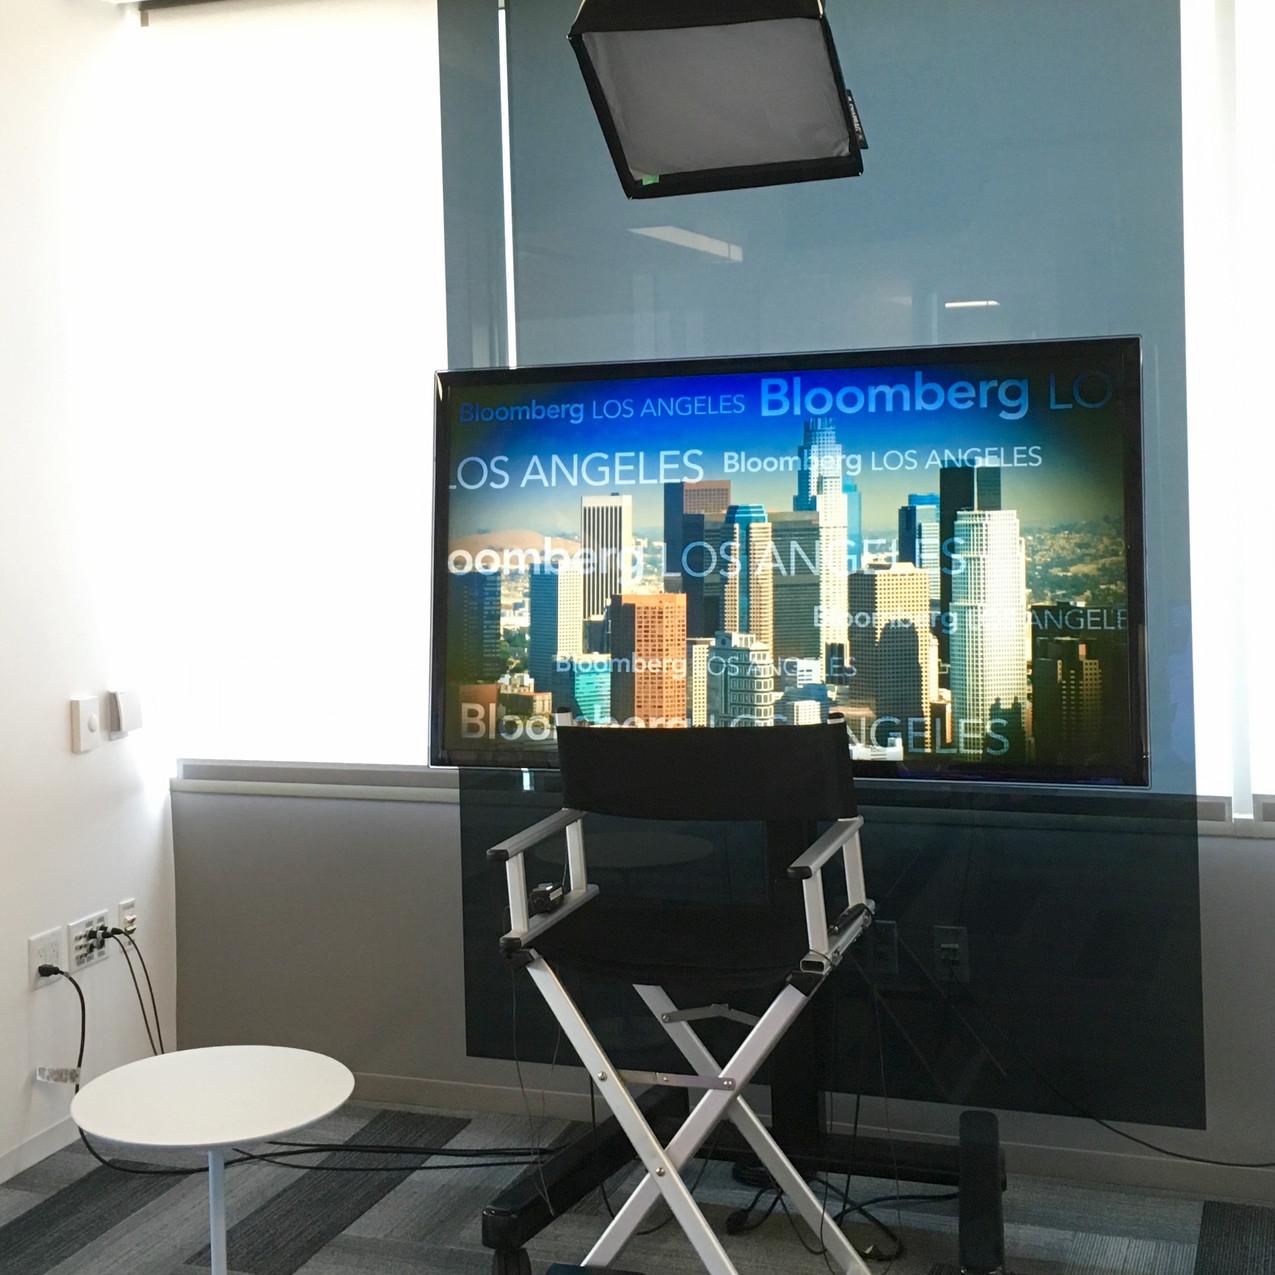 Bloomberg Office Los Angeles